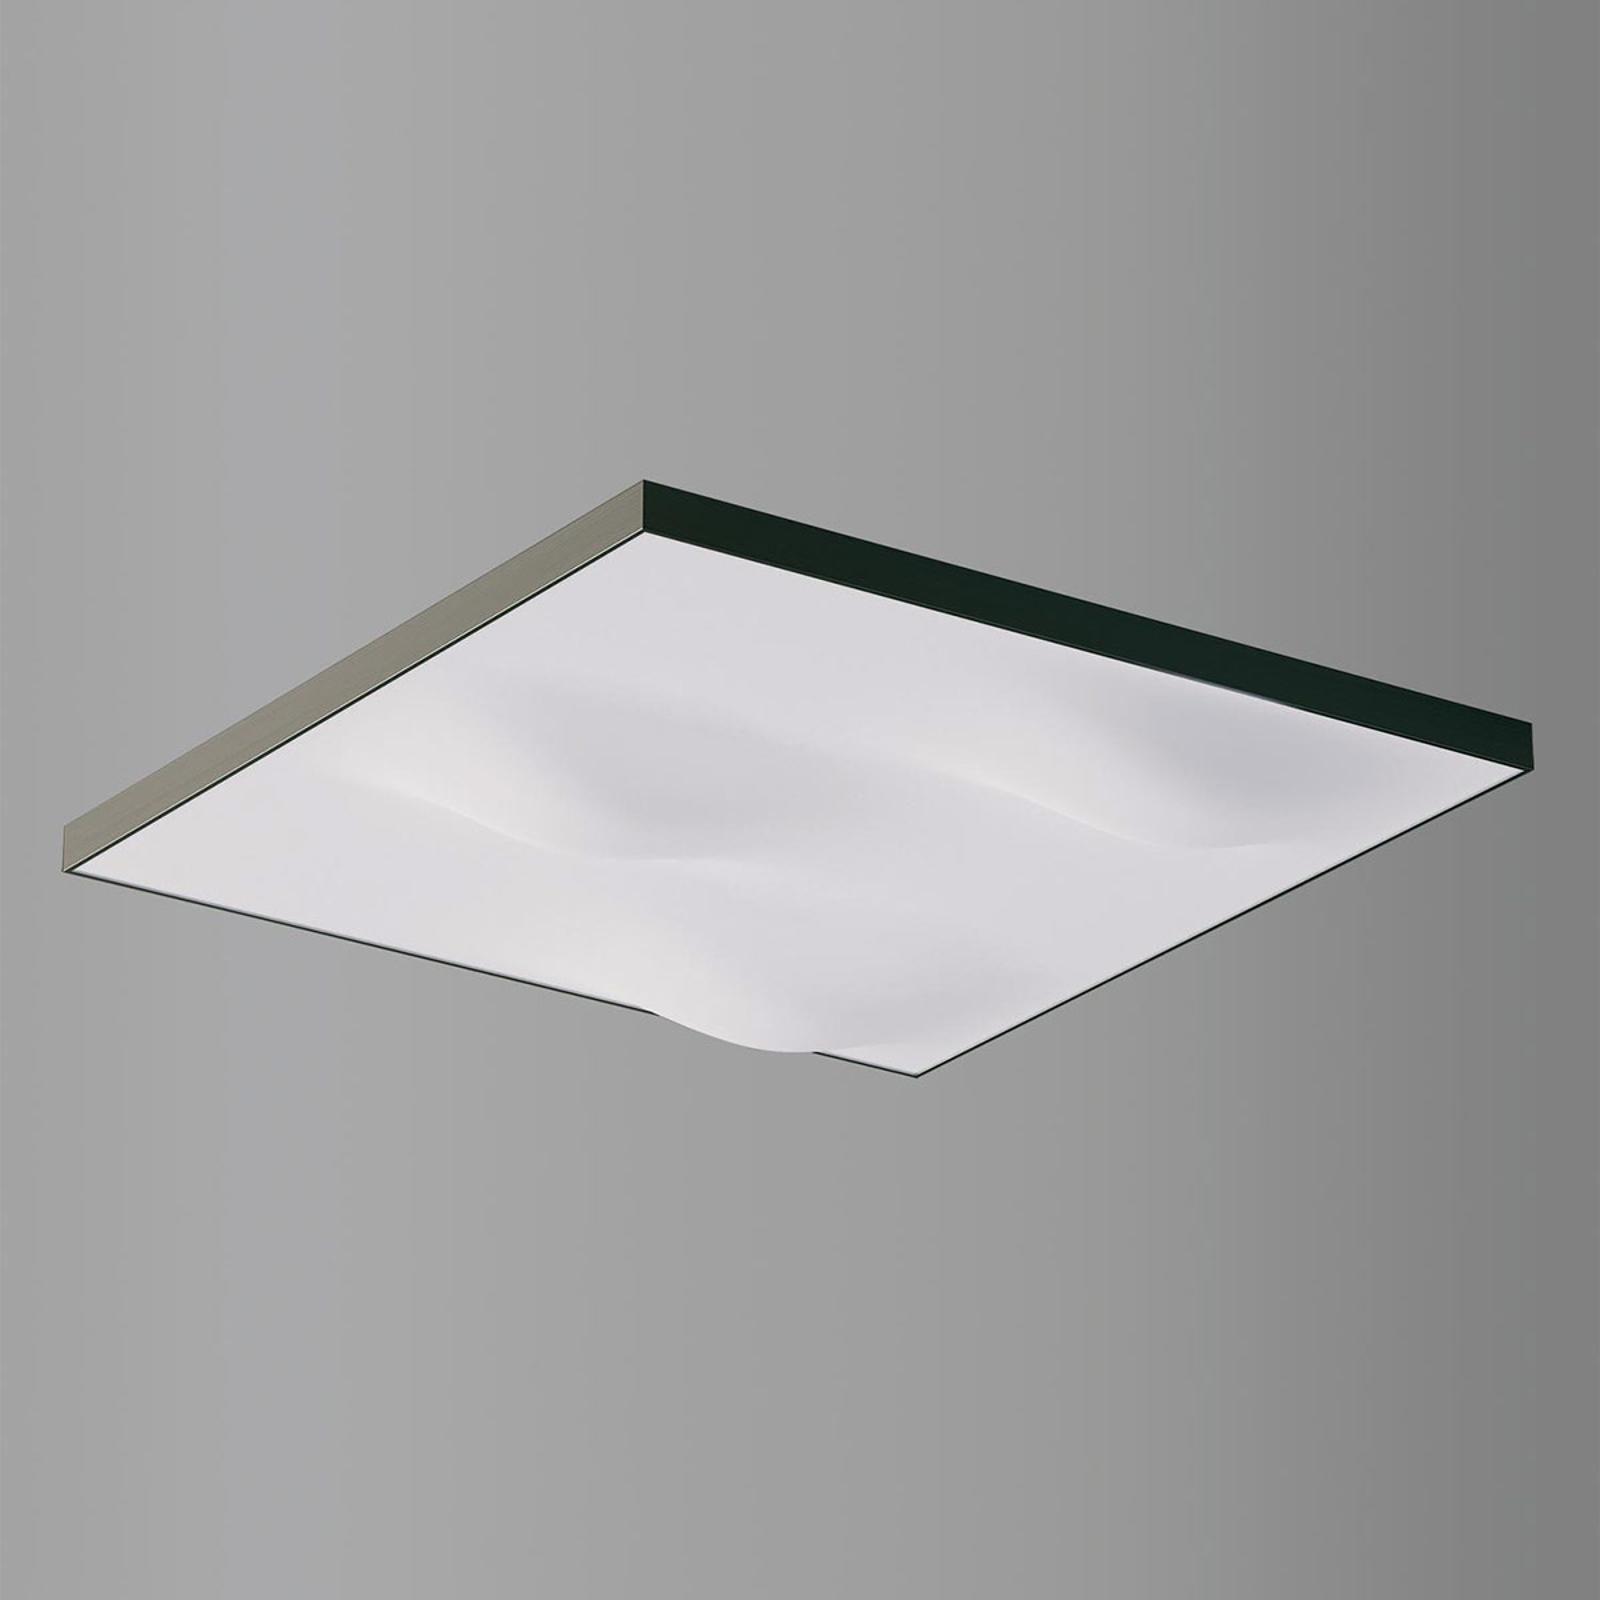 LED plafondlamp Curve